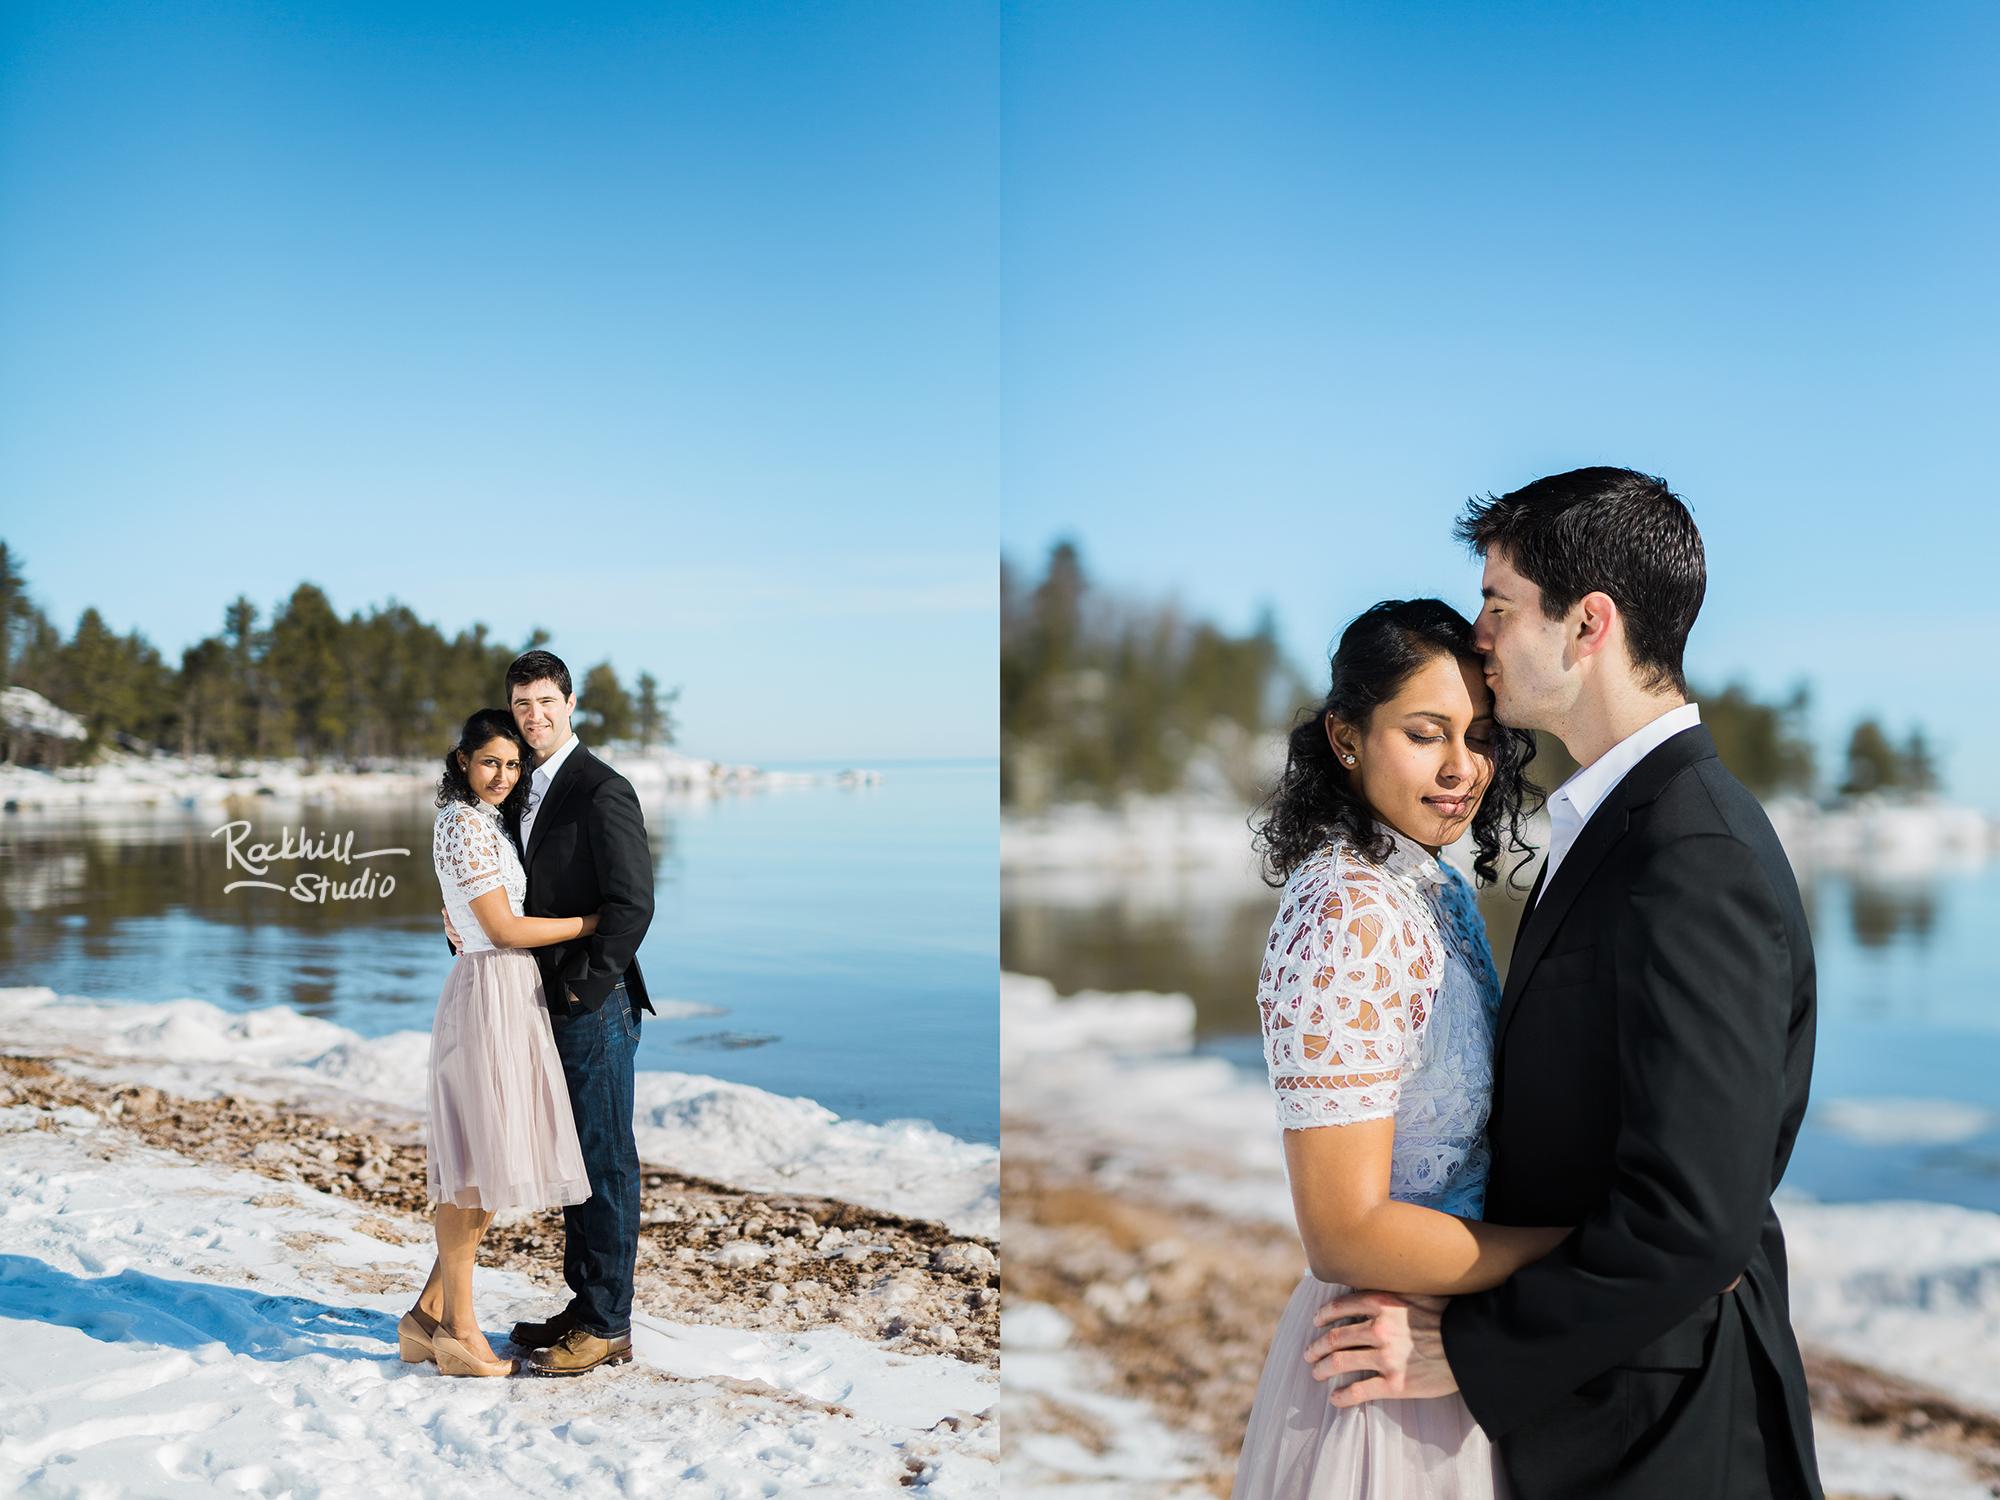 northern-michigan-wedding-marquette-engagement-upper-peninsula-michigan-rockhill-winter-23.jpg